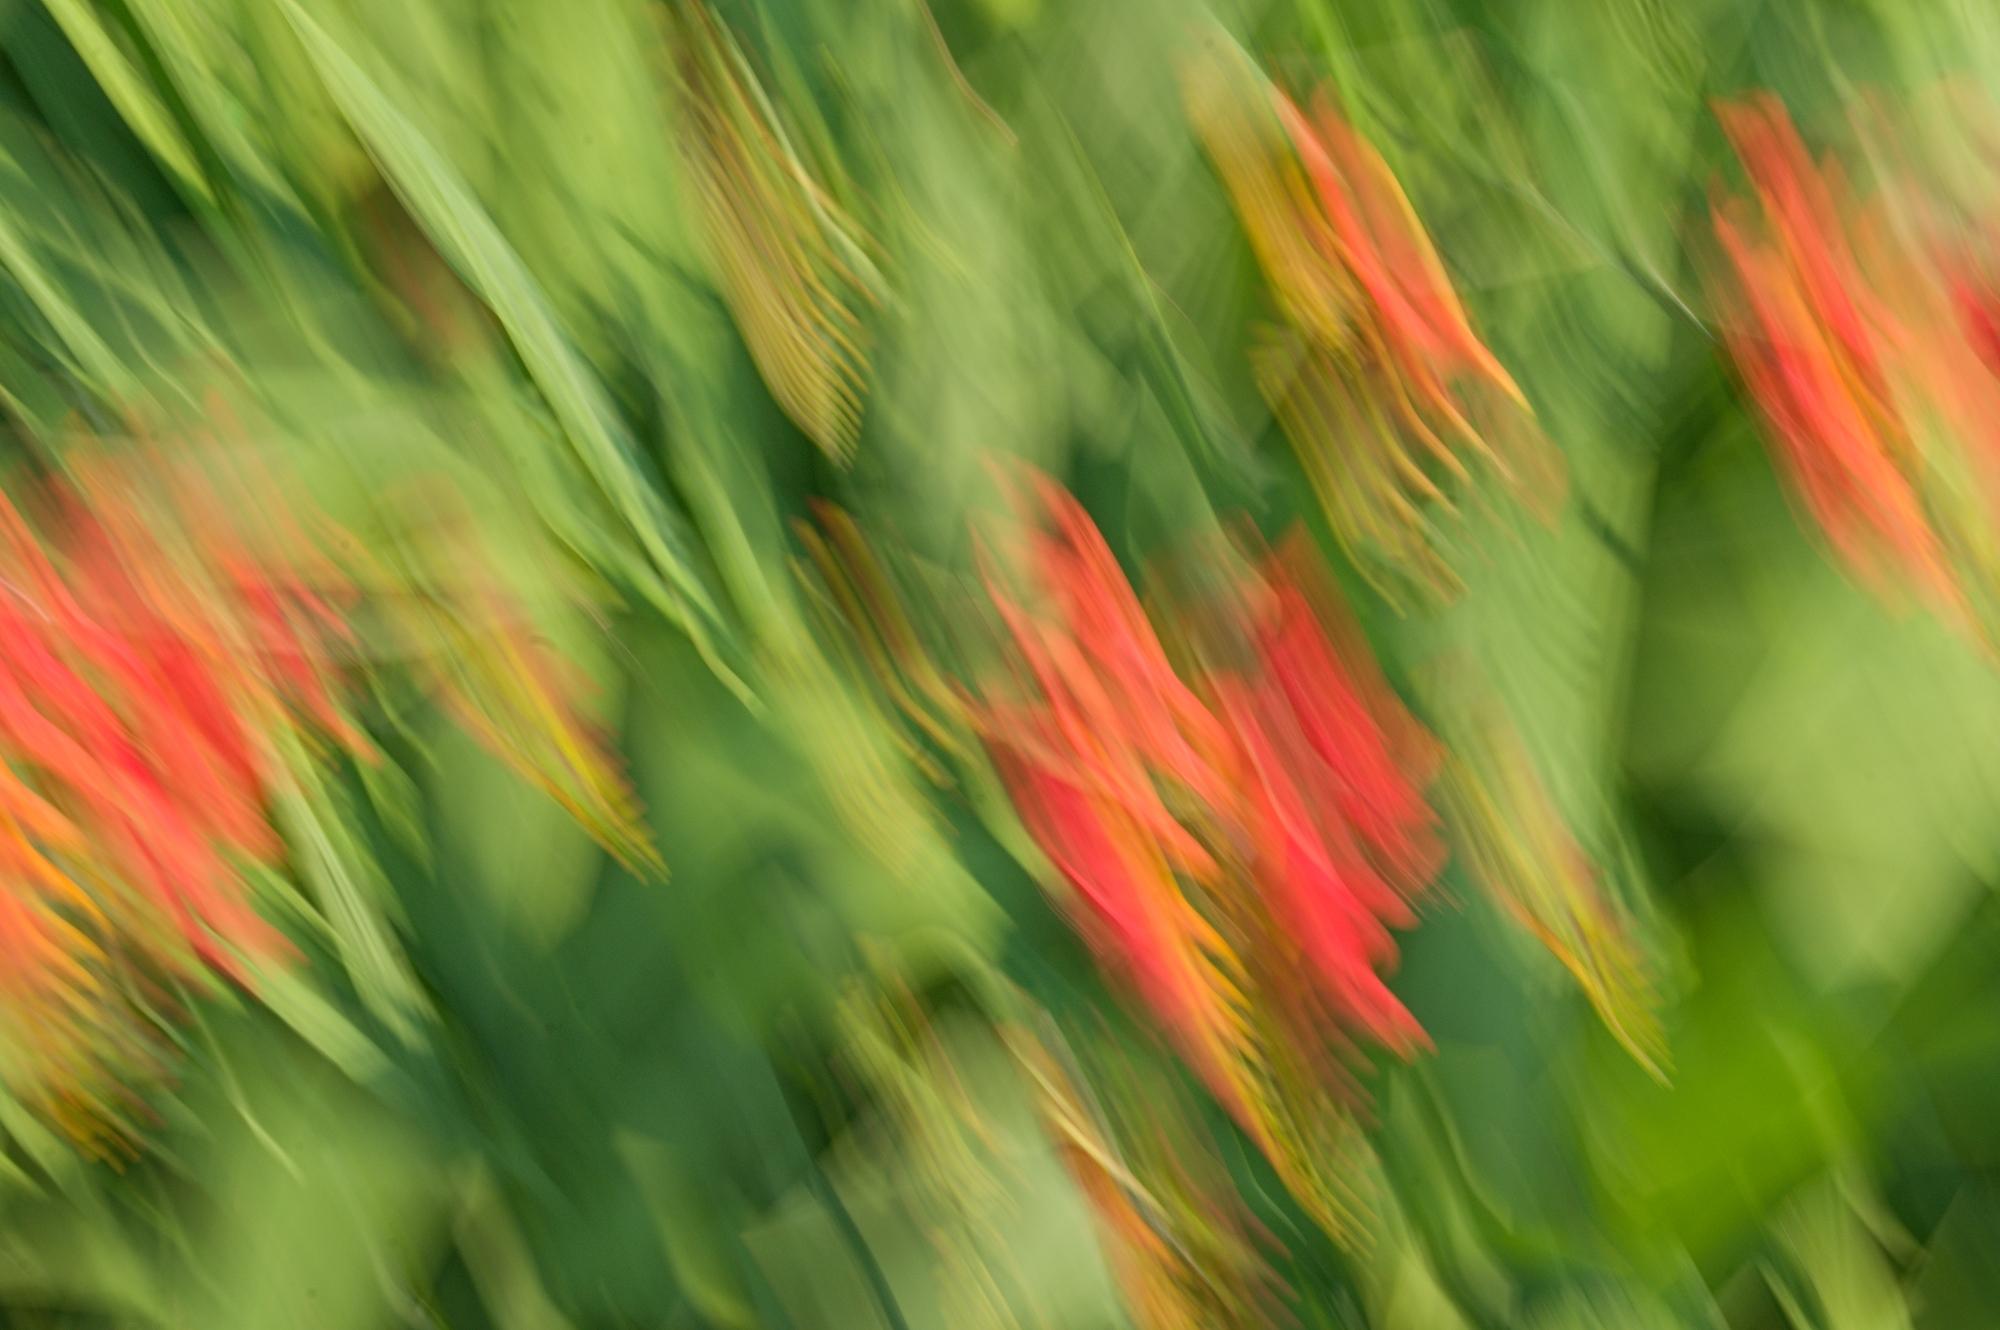 © Karen Crouse | Flower Movement